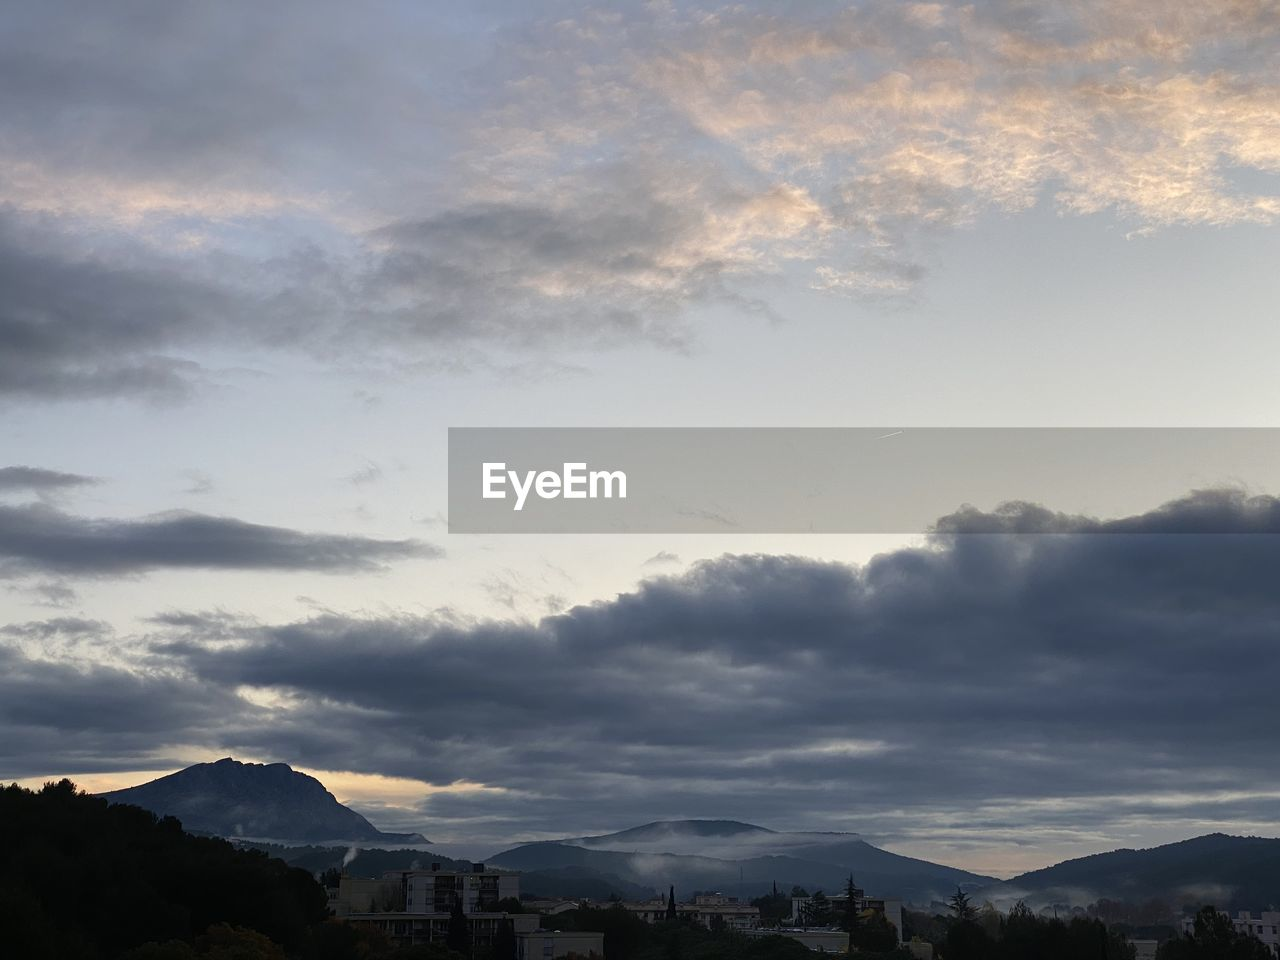 cloud - sky, sky, mountain, beauty in nature, scenics - nature, tranquility, mountain range, nature, tranquil scene, no people, sunset, silhouette, outdoors, idyllic, landscape, non-urban scene, environment, sunlight, day, mountain peak